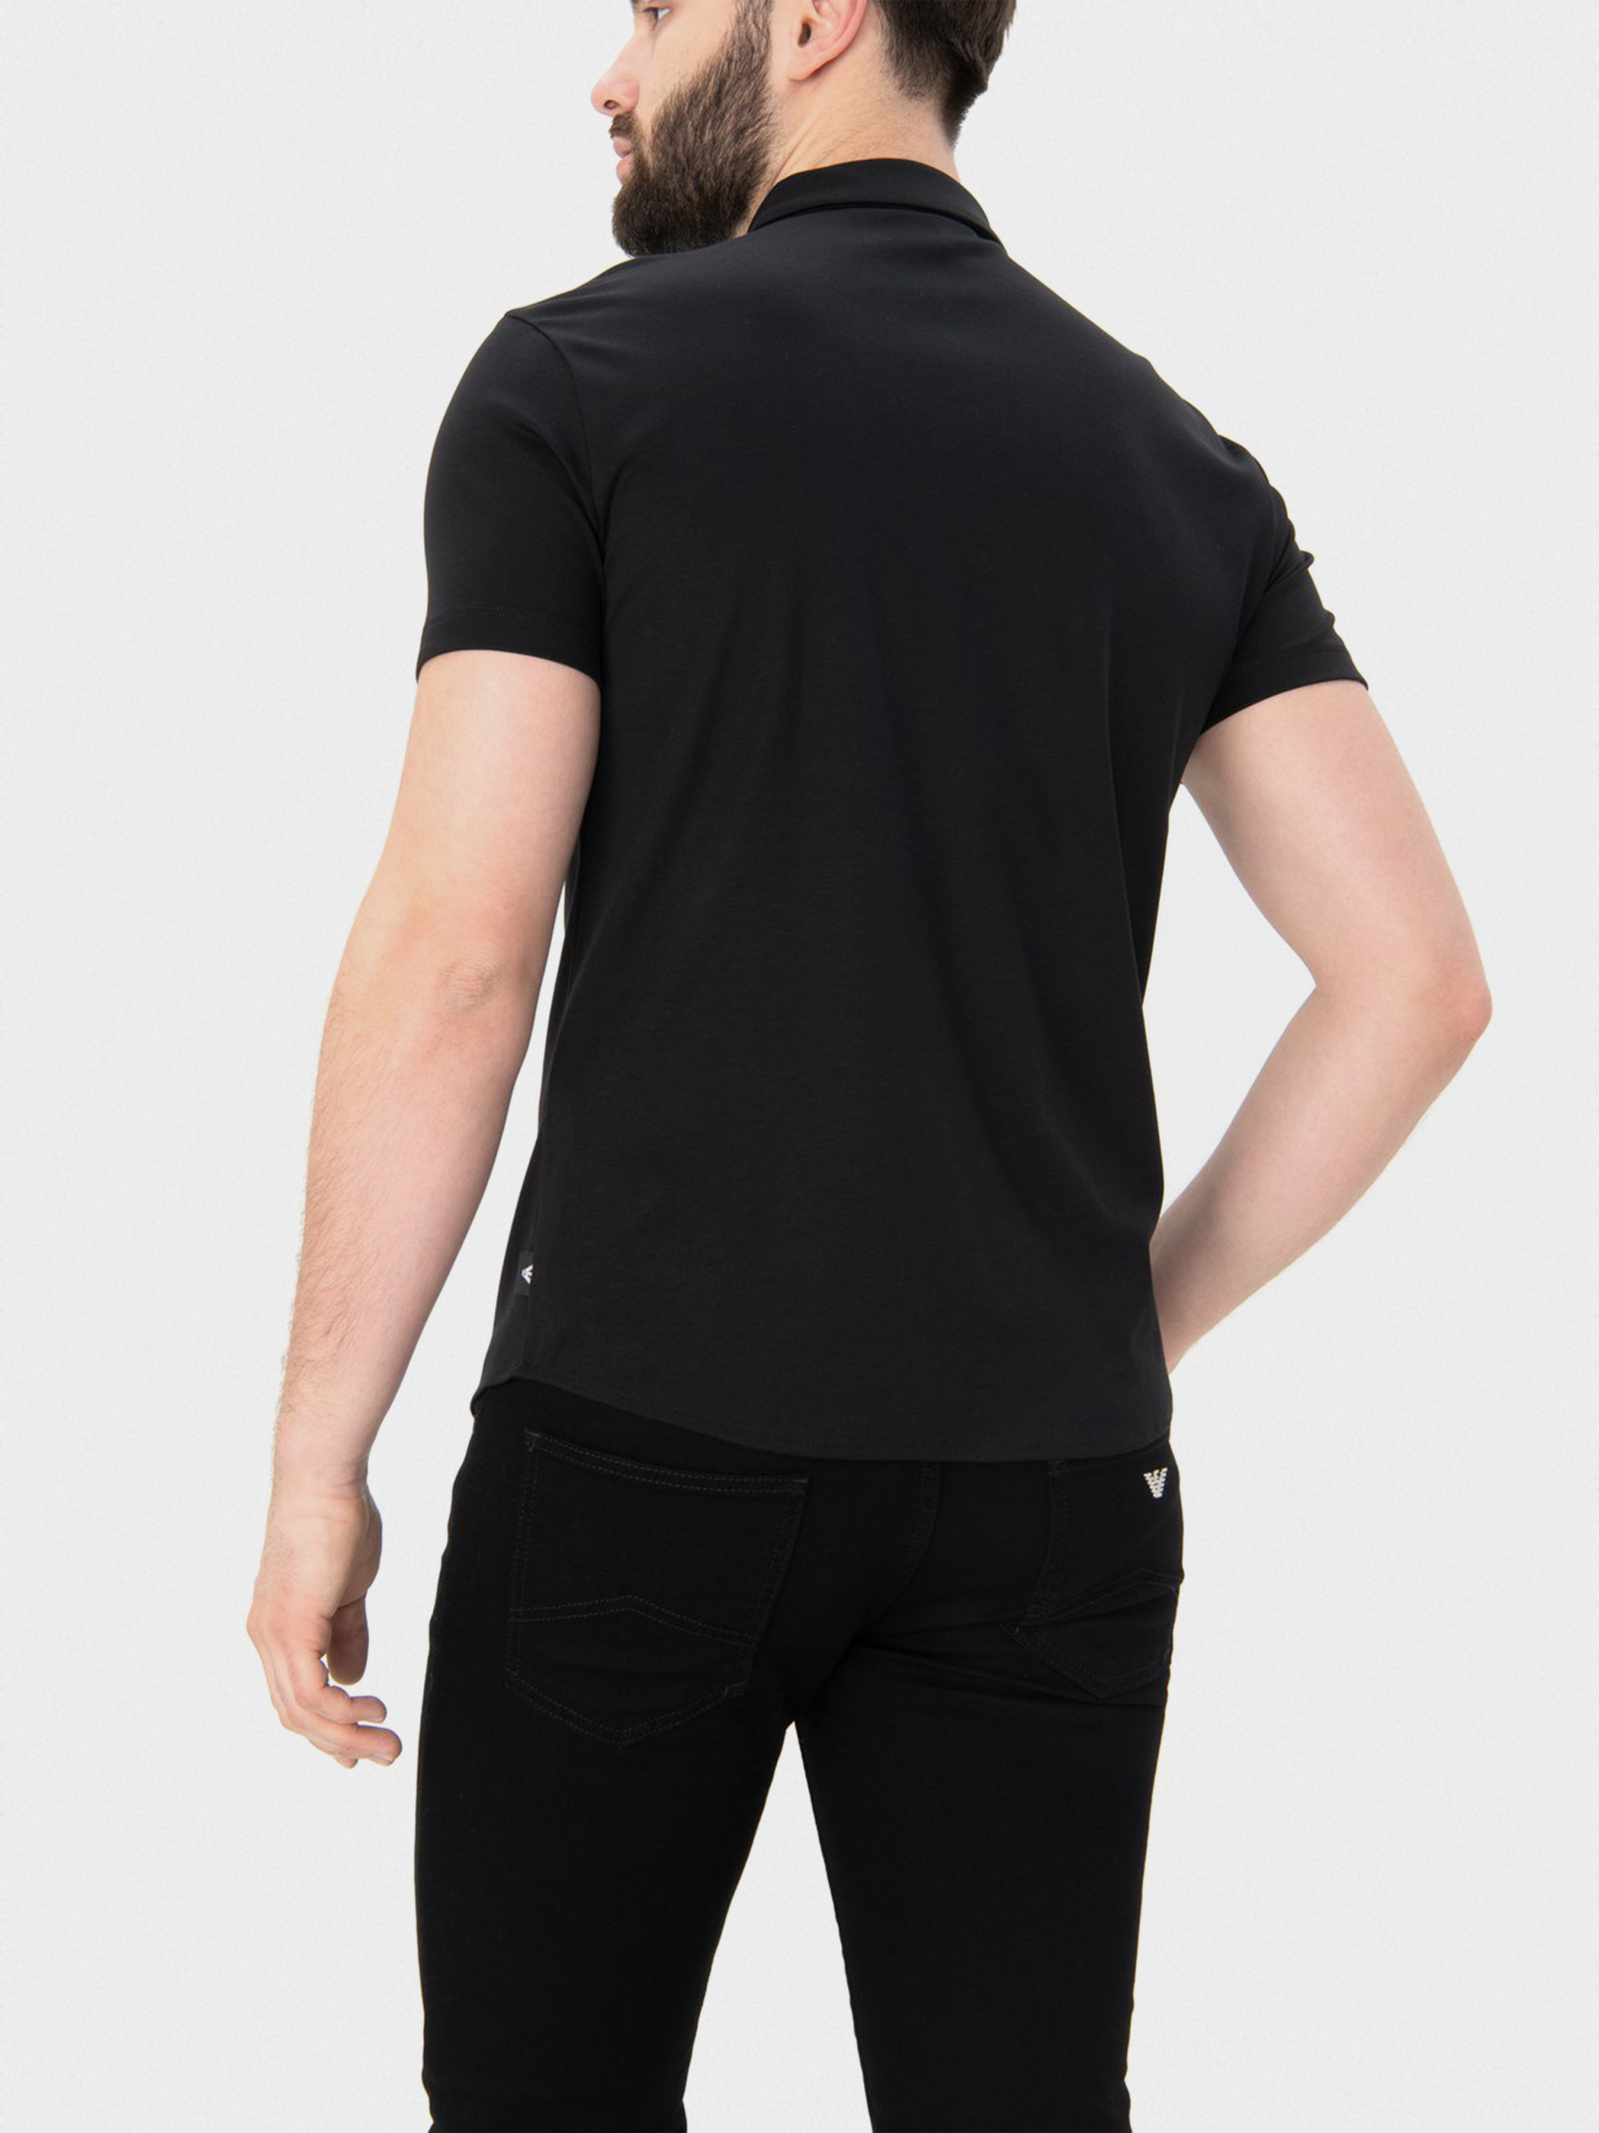 Рубашка мужские Emporio Armani модель 8N1CH5-1JPRZ-0999 , 2017